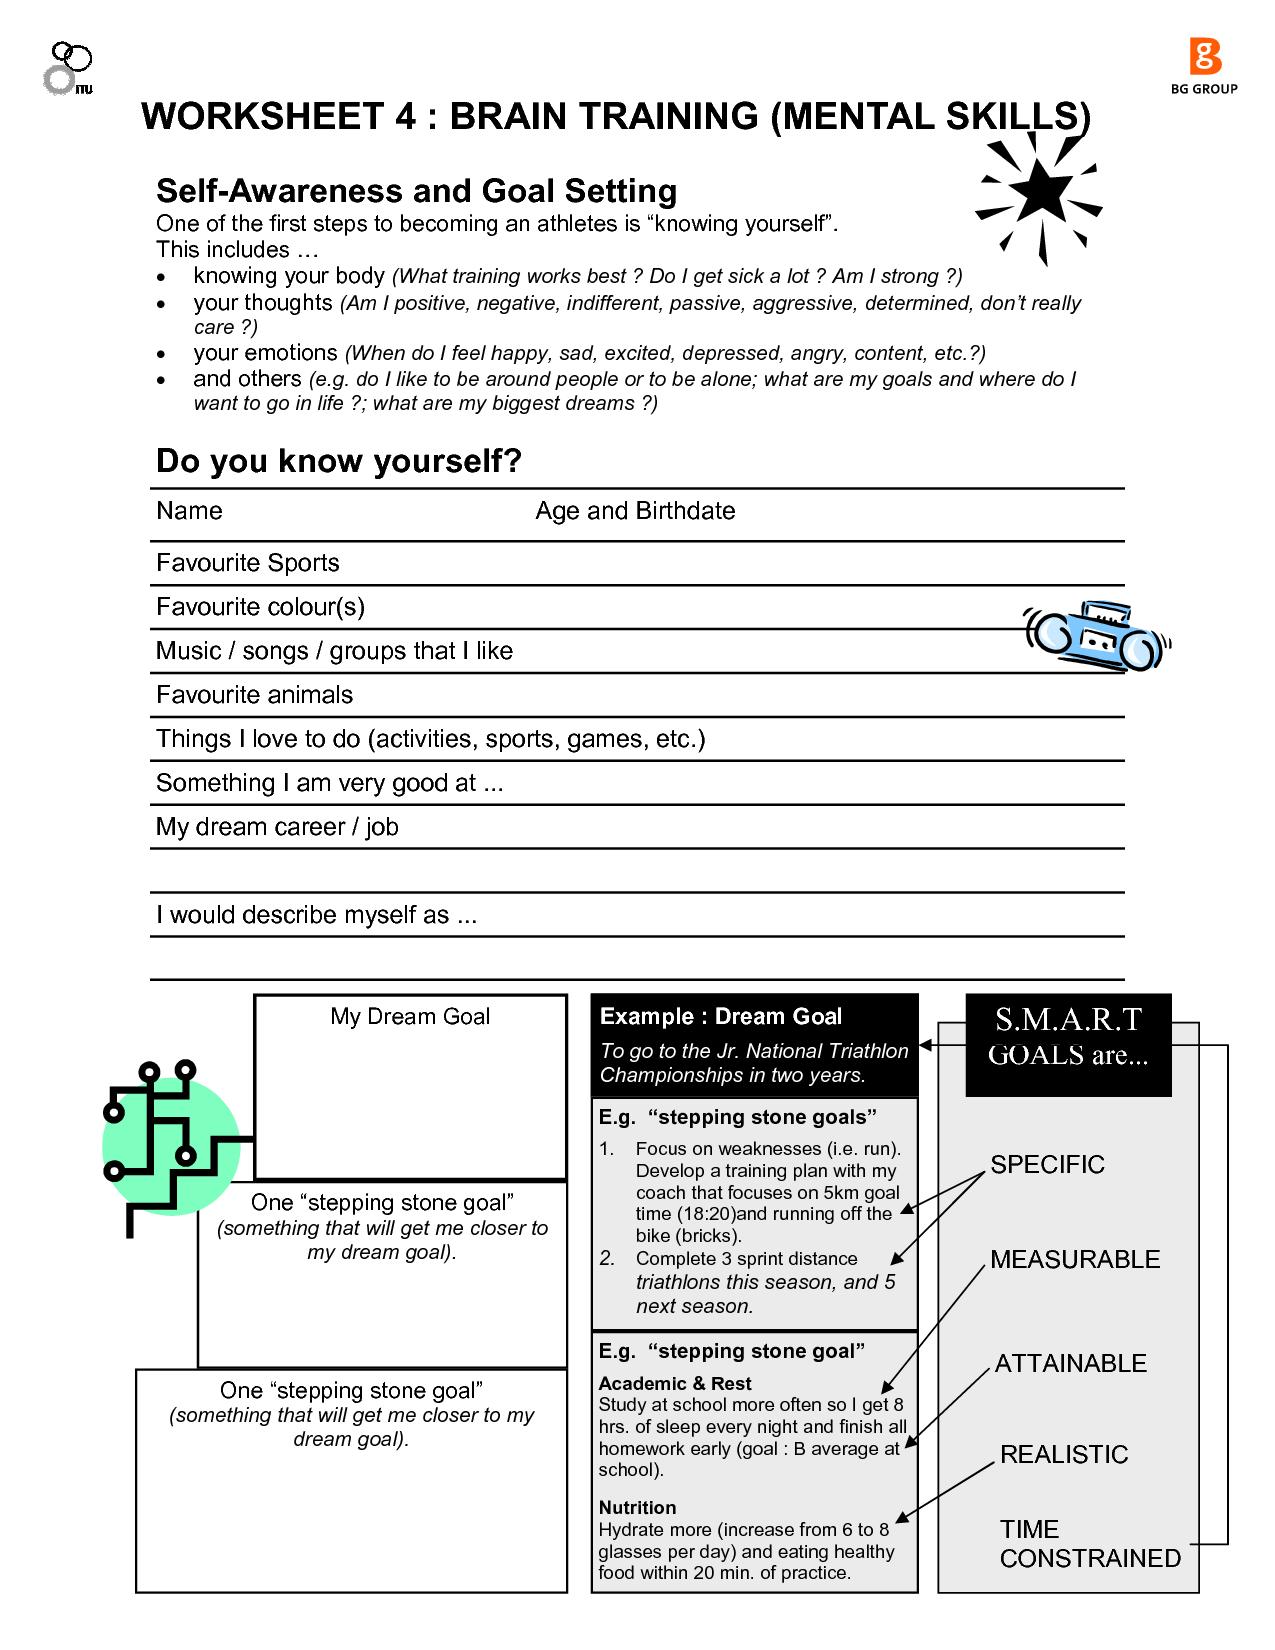 18 Best Images of Job-Skills Worksheets Free Printable ...